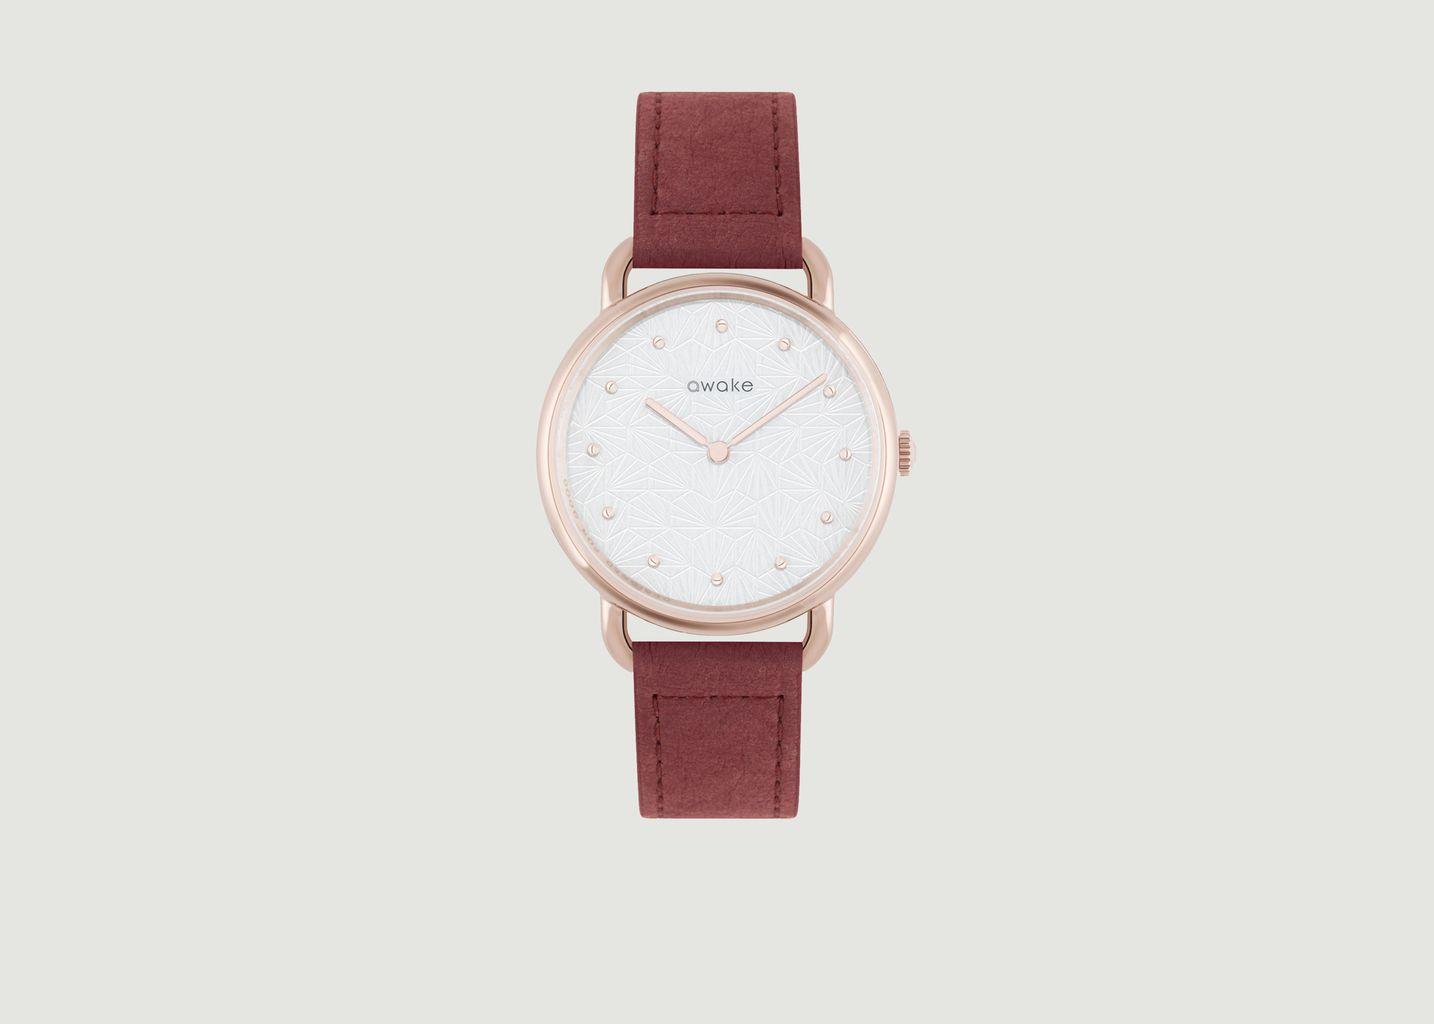 Montre avec bracelet cellulose Odyssée - Awake Concept